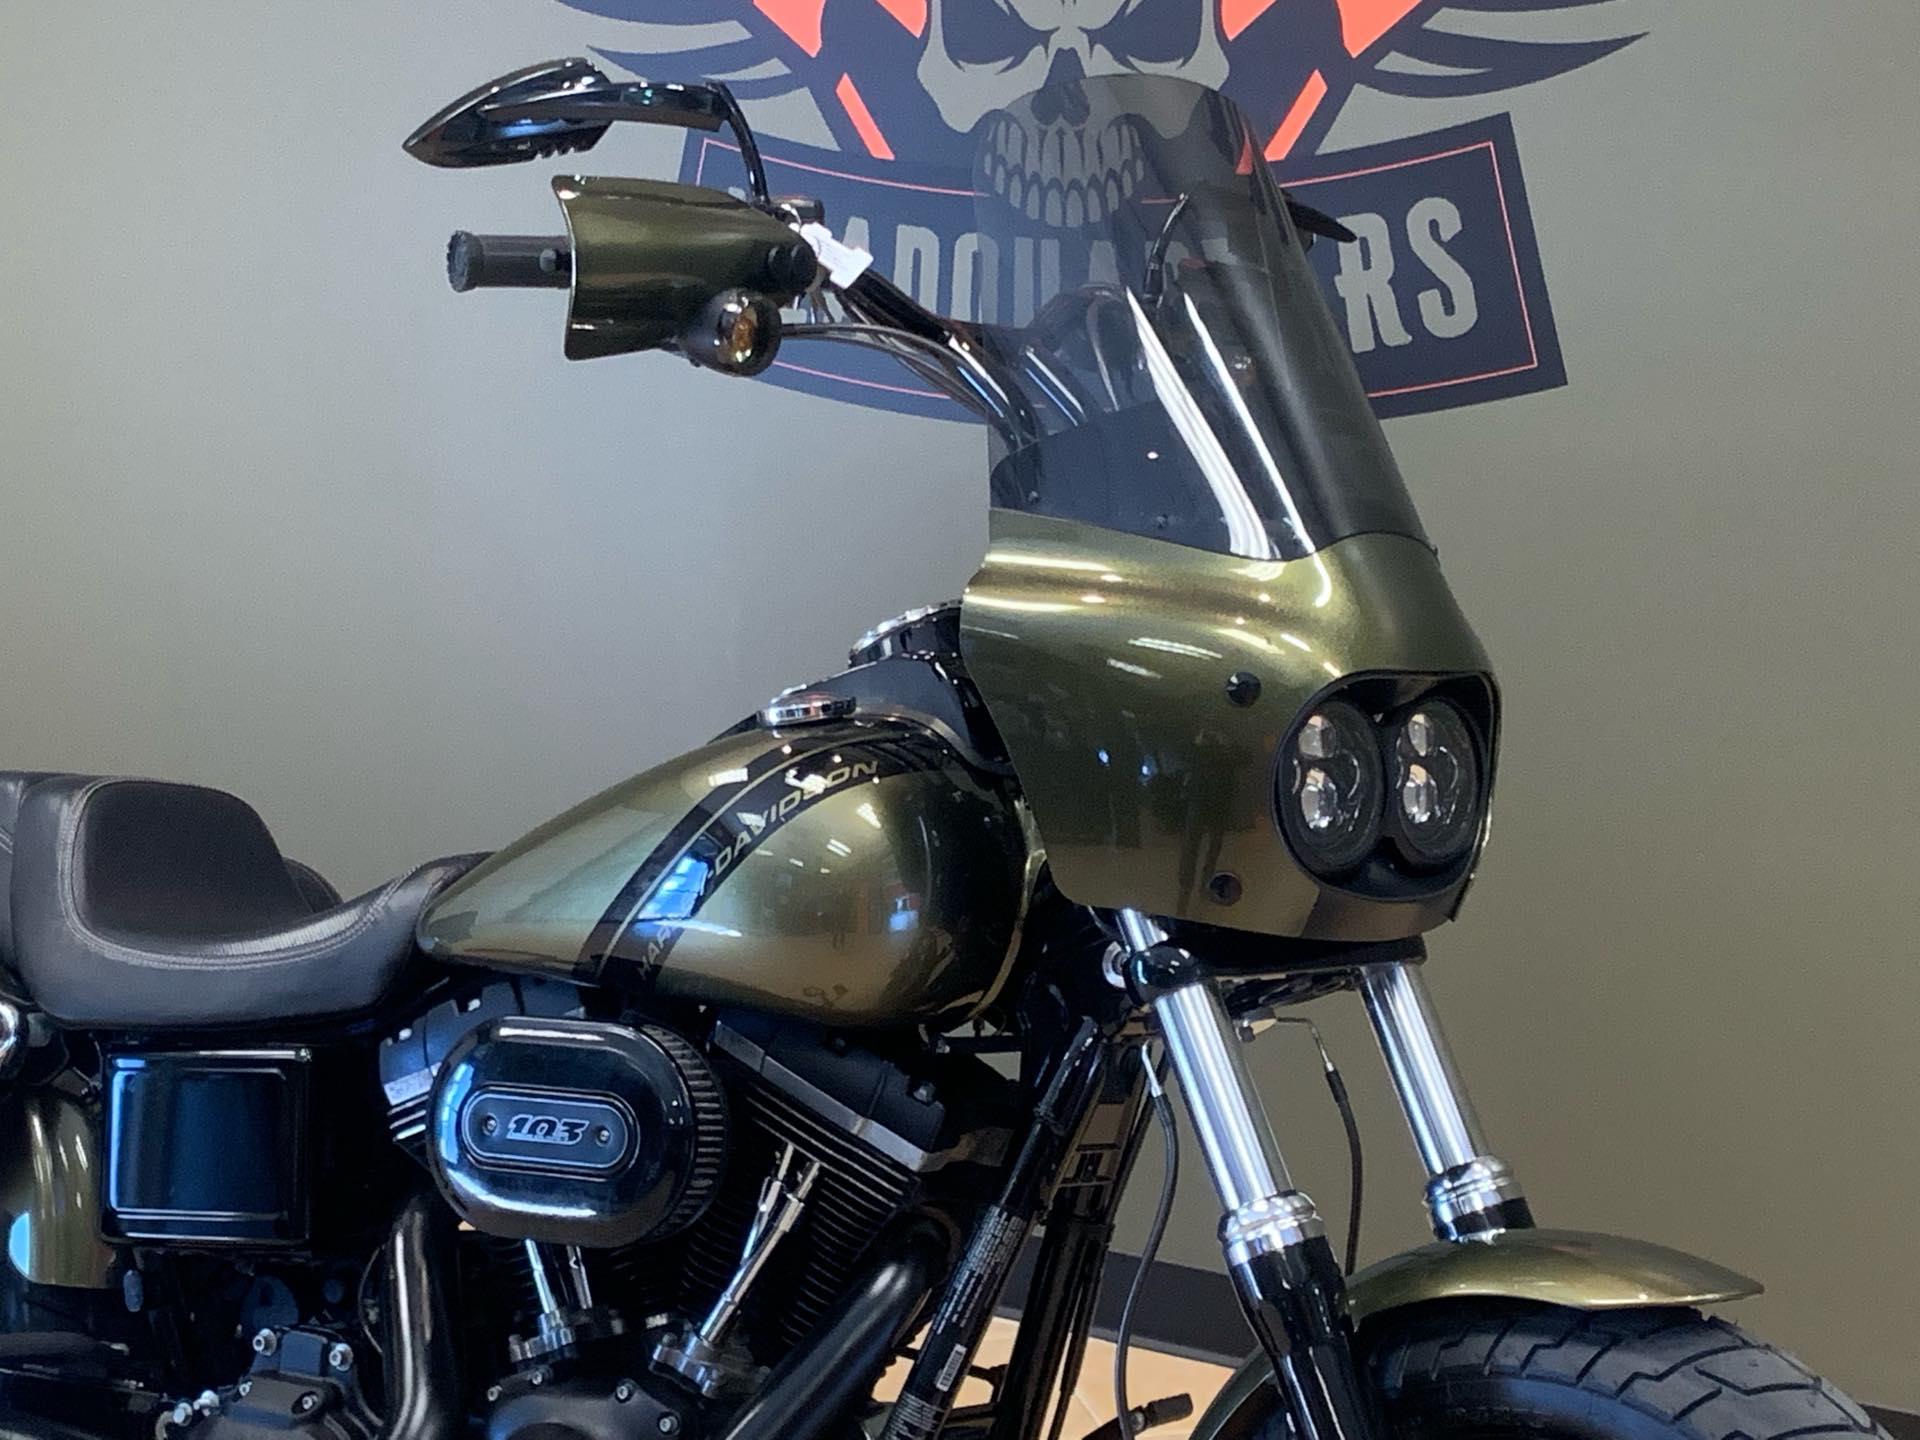 2016 Harley-Davidson Dyna Fat Bob at Loess Hills Harley-Davidson